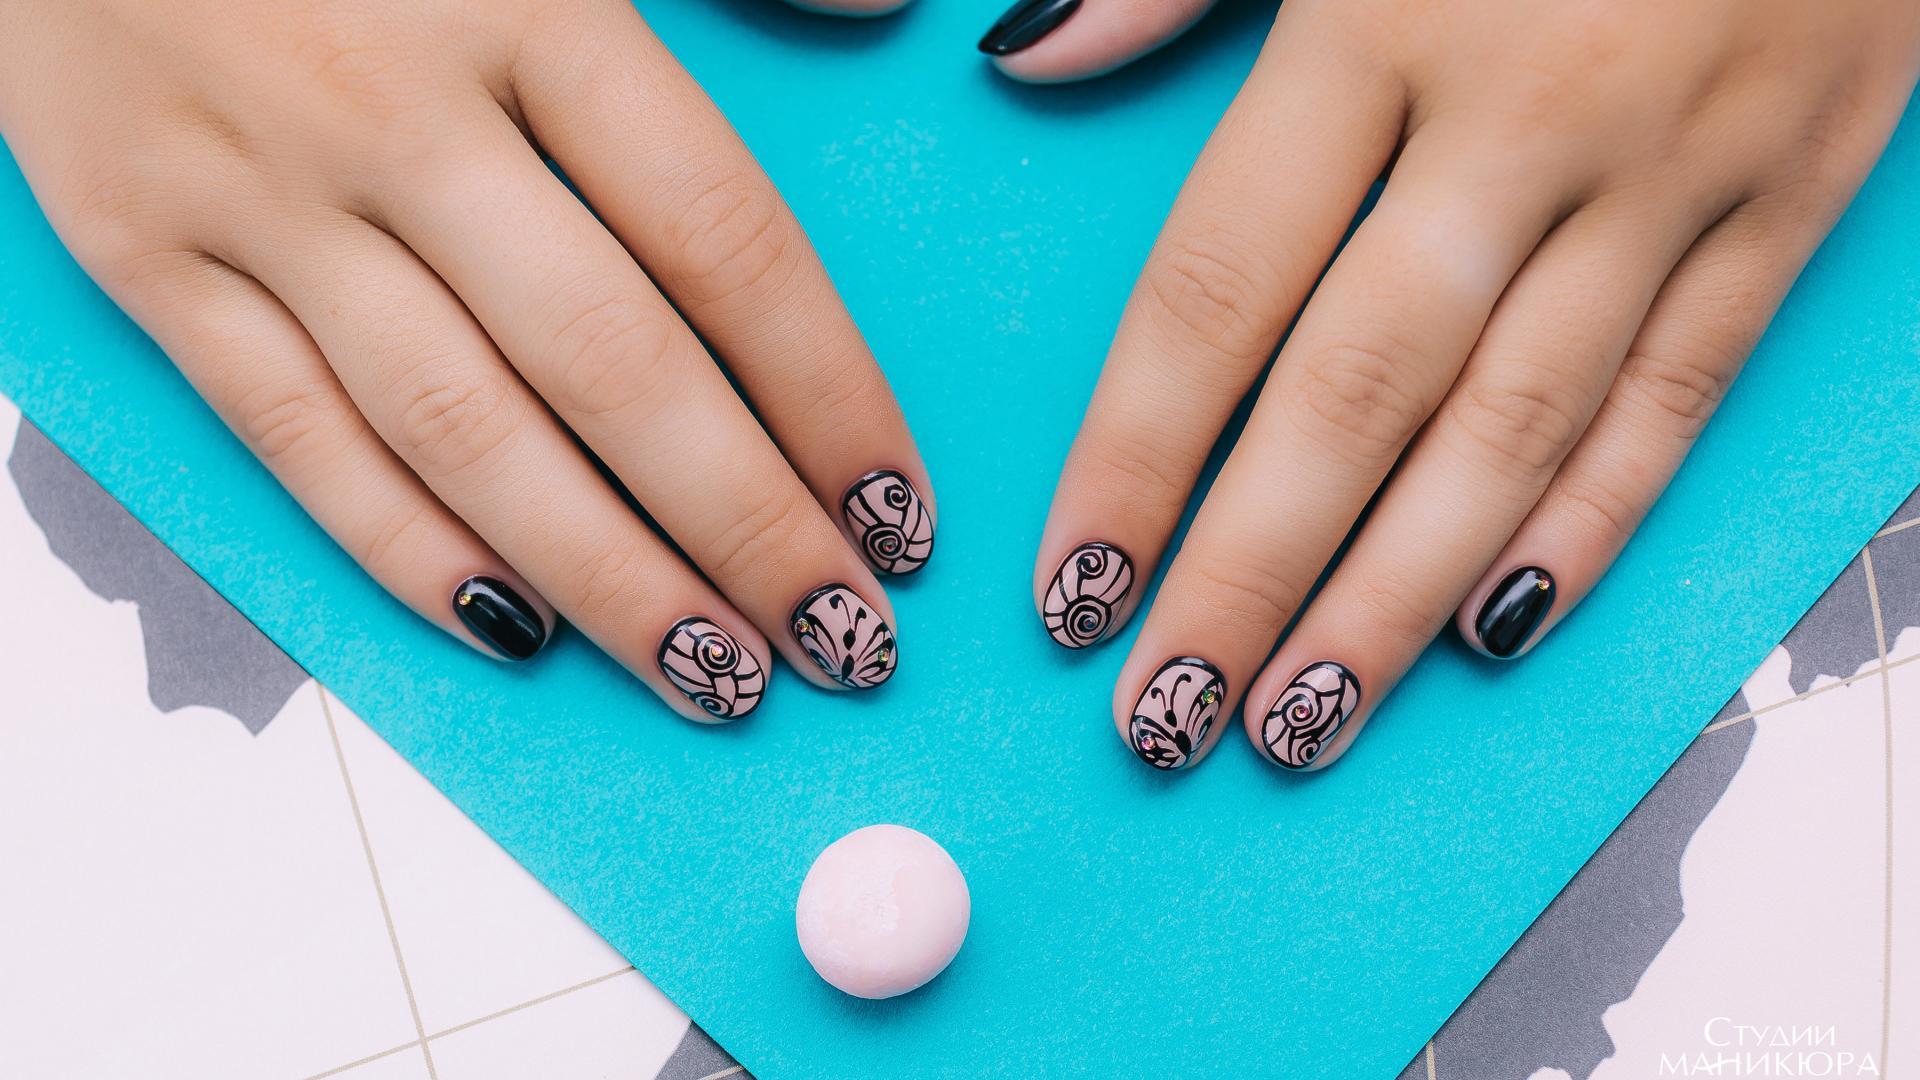 original_5763b54a3f79a5c9388b456d_5853c1f38d6b1 Красивый маникюр на короткие ногти 2019-2020: фото идеи маникюра на короткие ногти